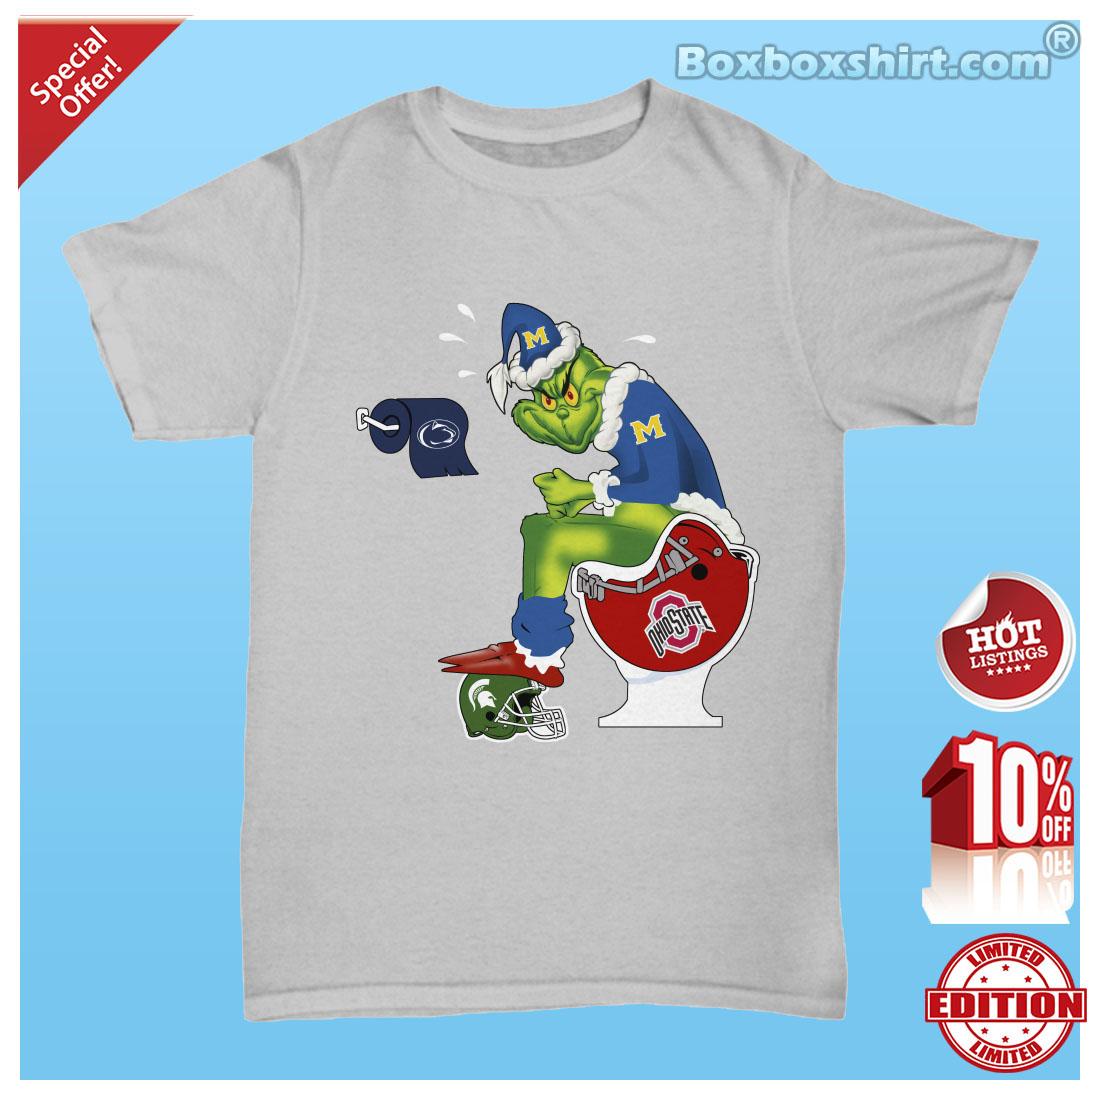 Santa Grinch sit on toliet NFL logo team shirt 1